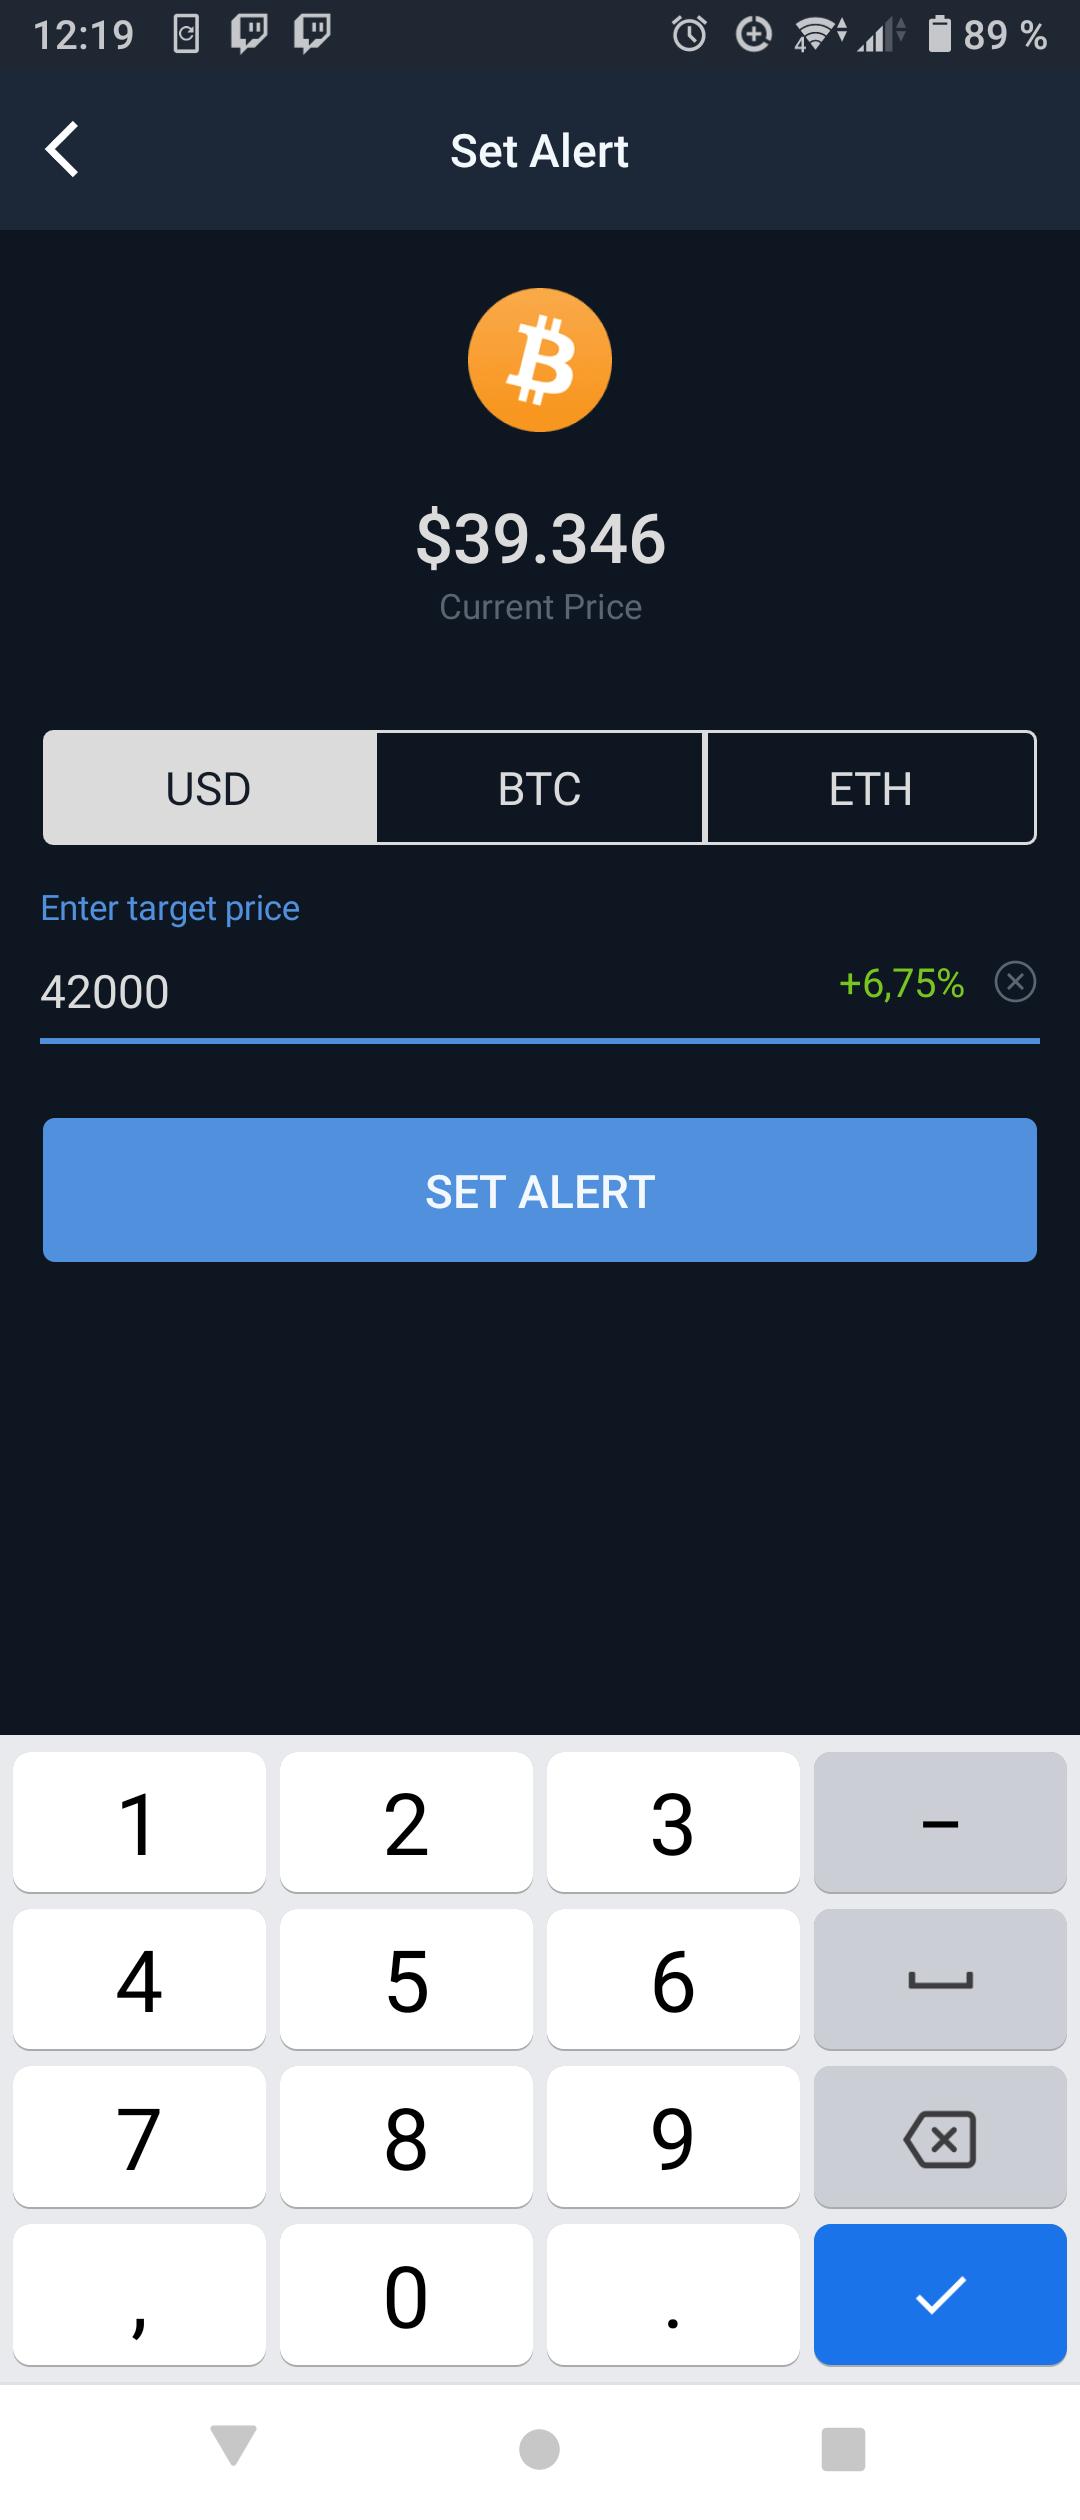 coincodex set alert